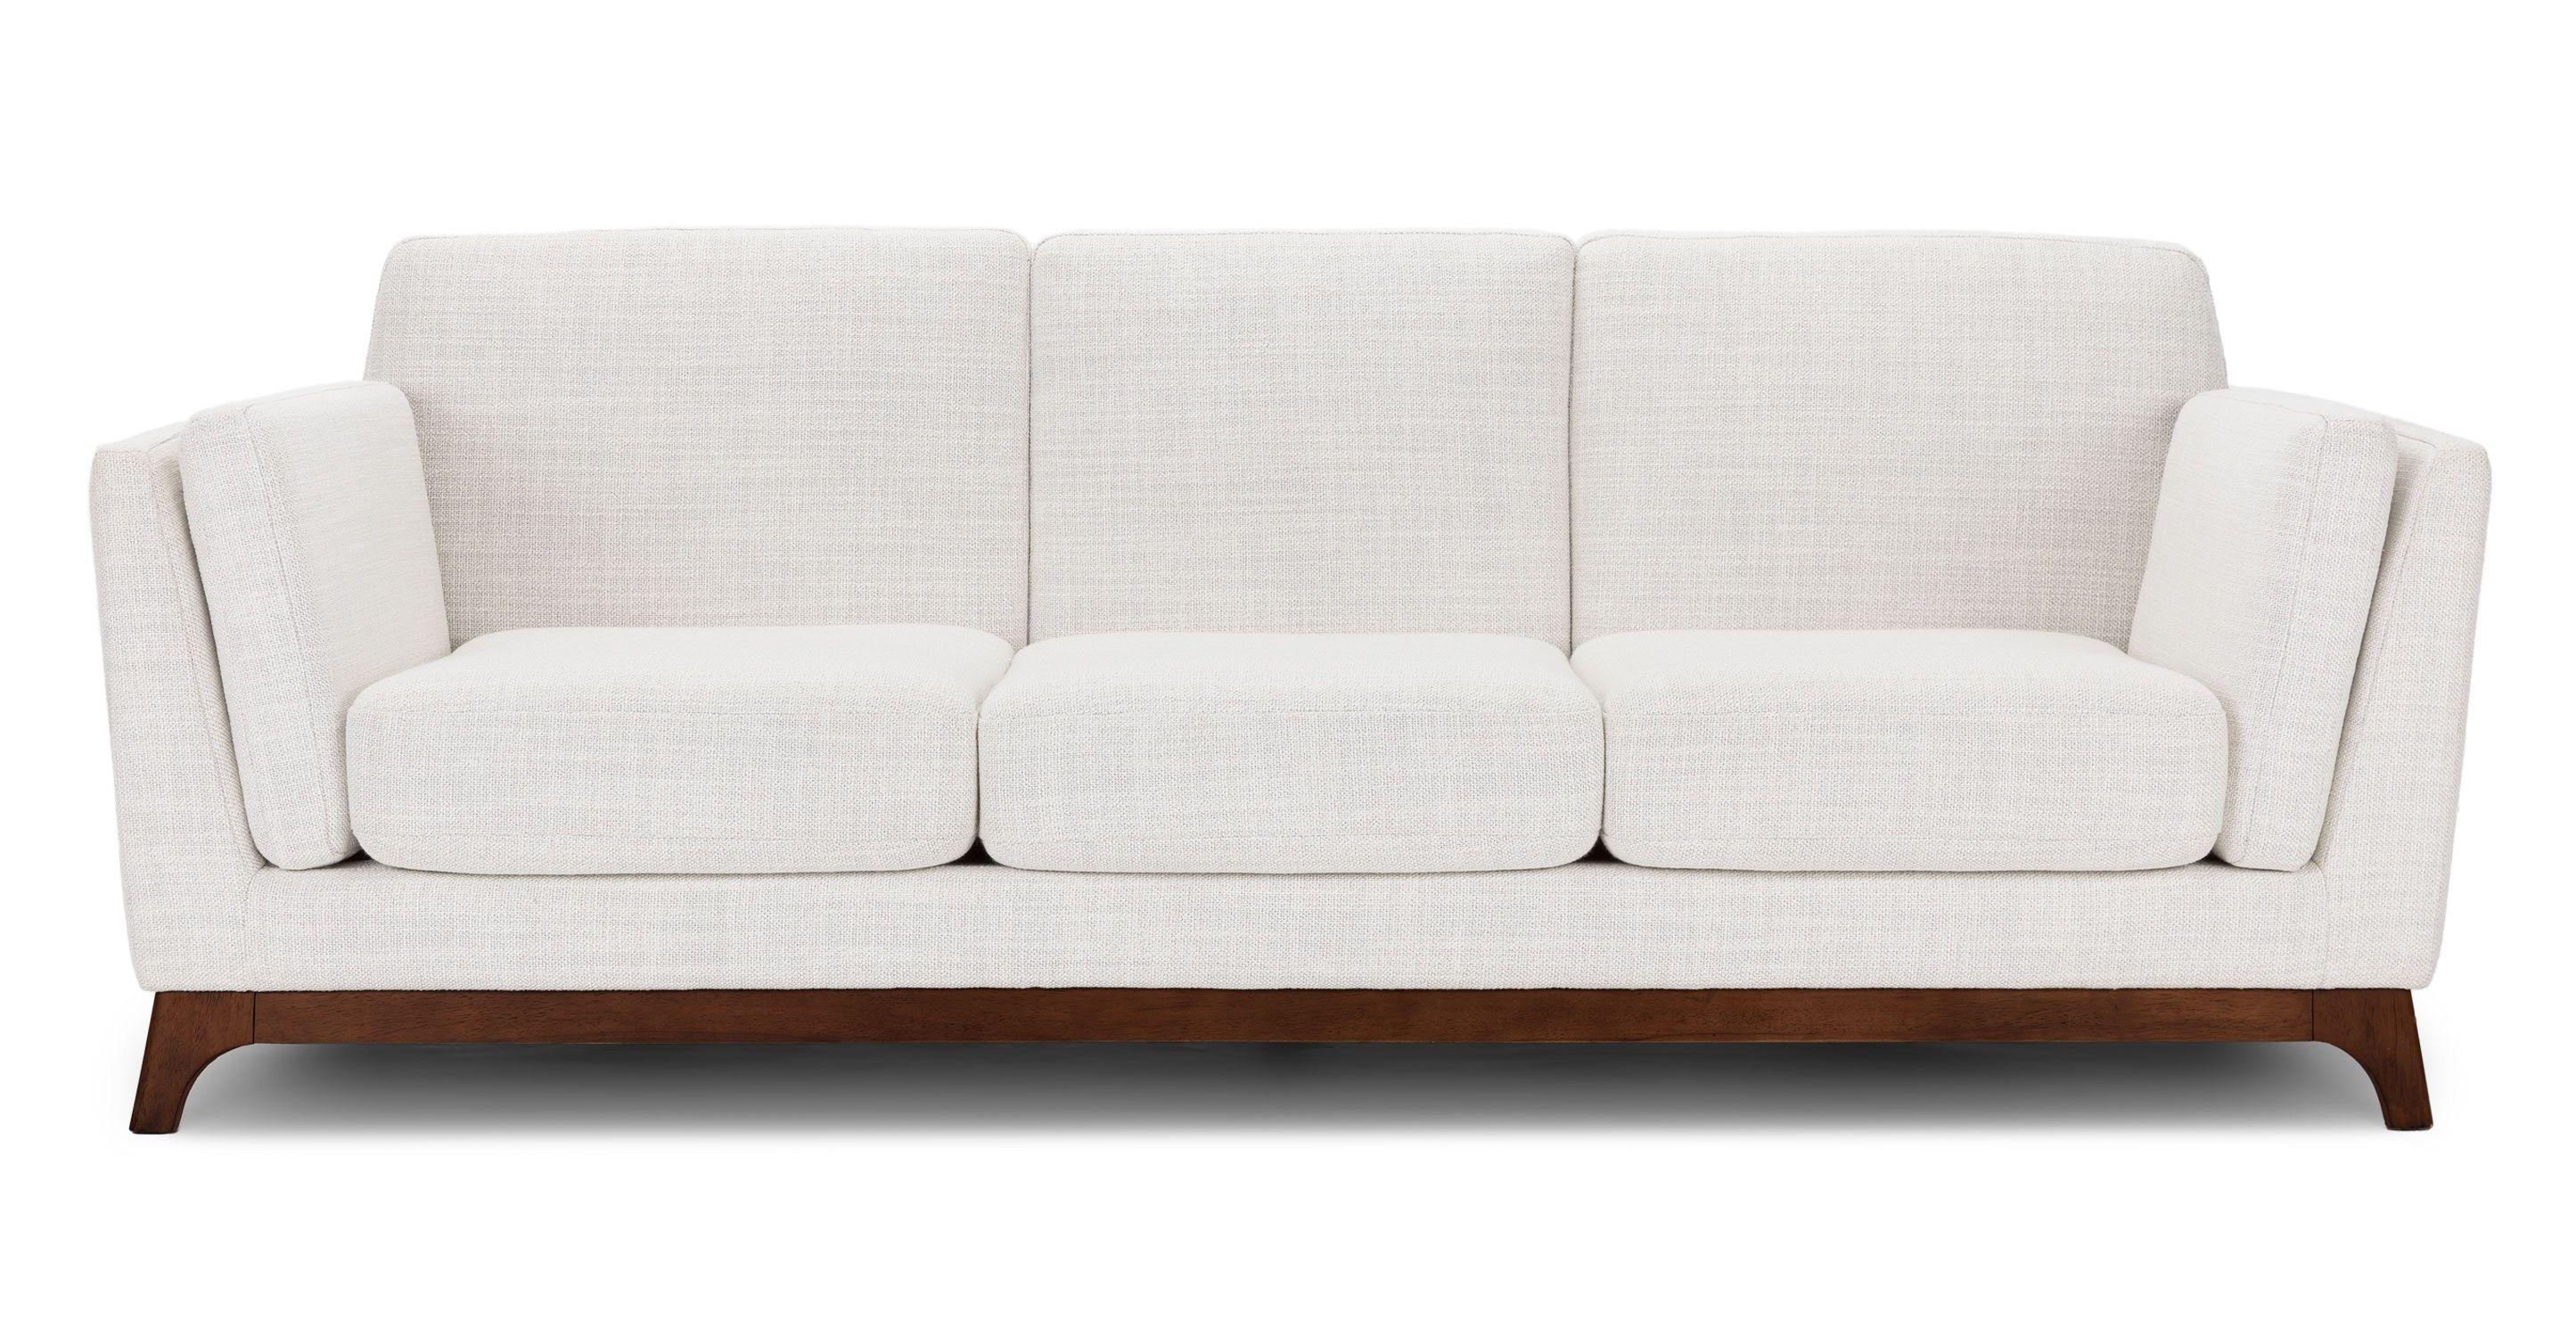 Ceni Fresh White Sofa Living Room Furniture Sofas White Sofas Living Room Scandinavian